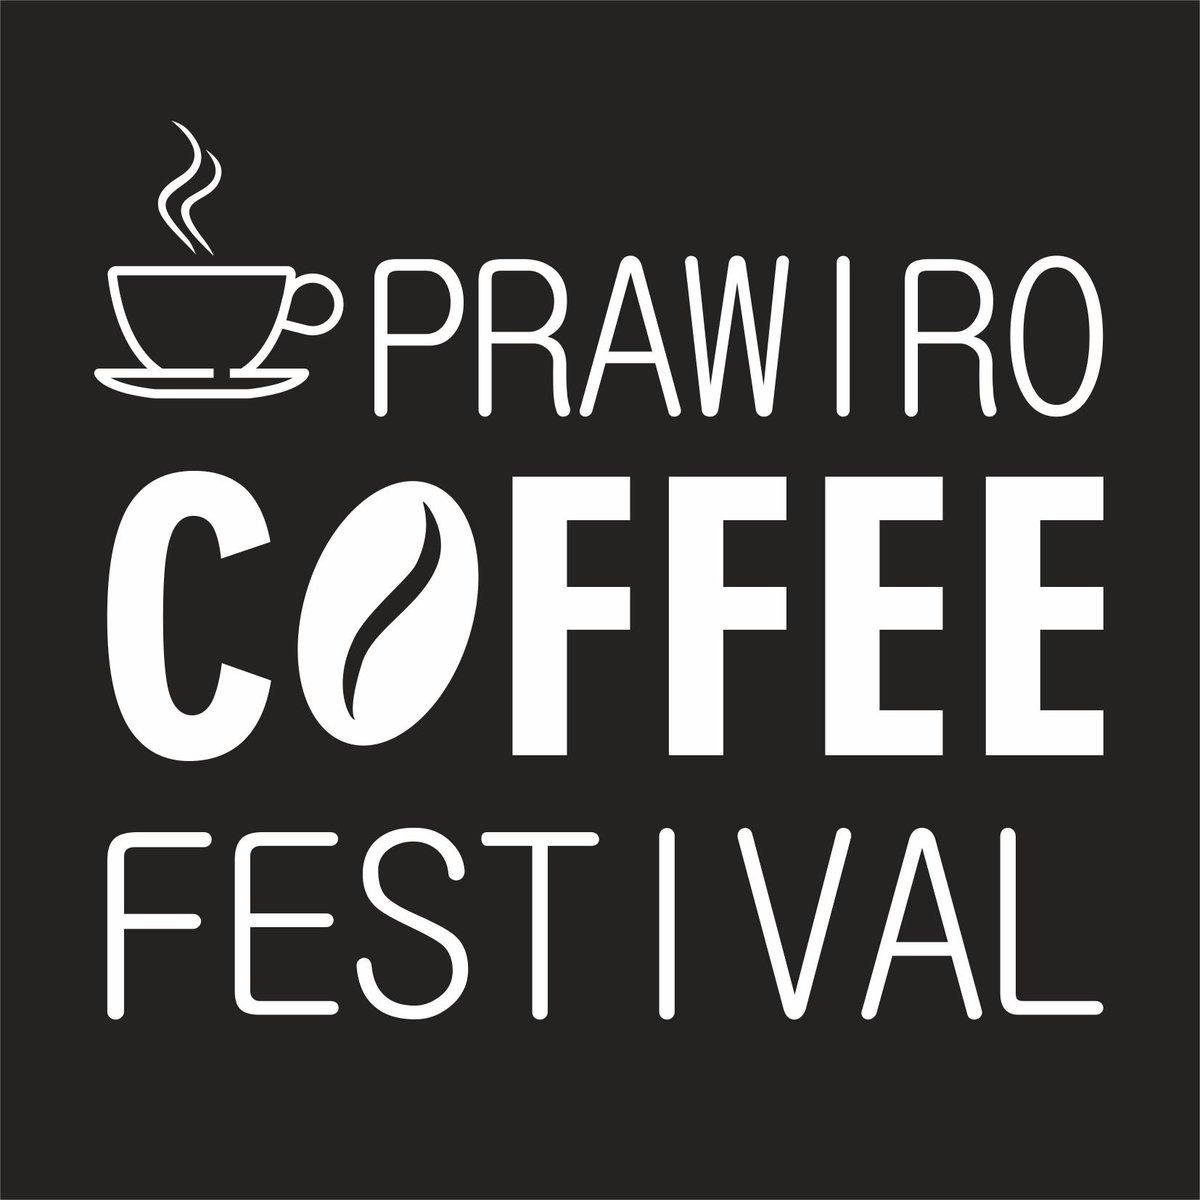 Komunitas Kopi Nusantara akan menggelar festival kopi bertajuk Prawiro Coffee Festival#2